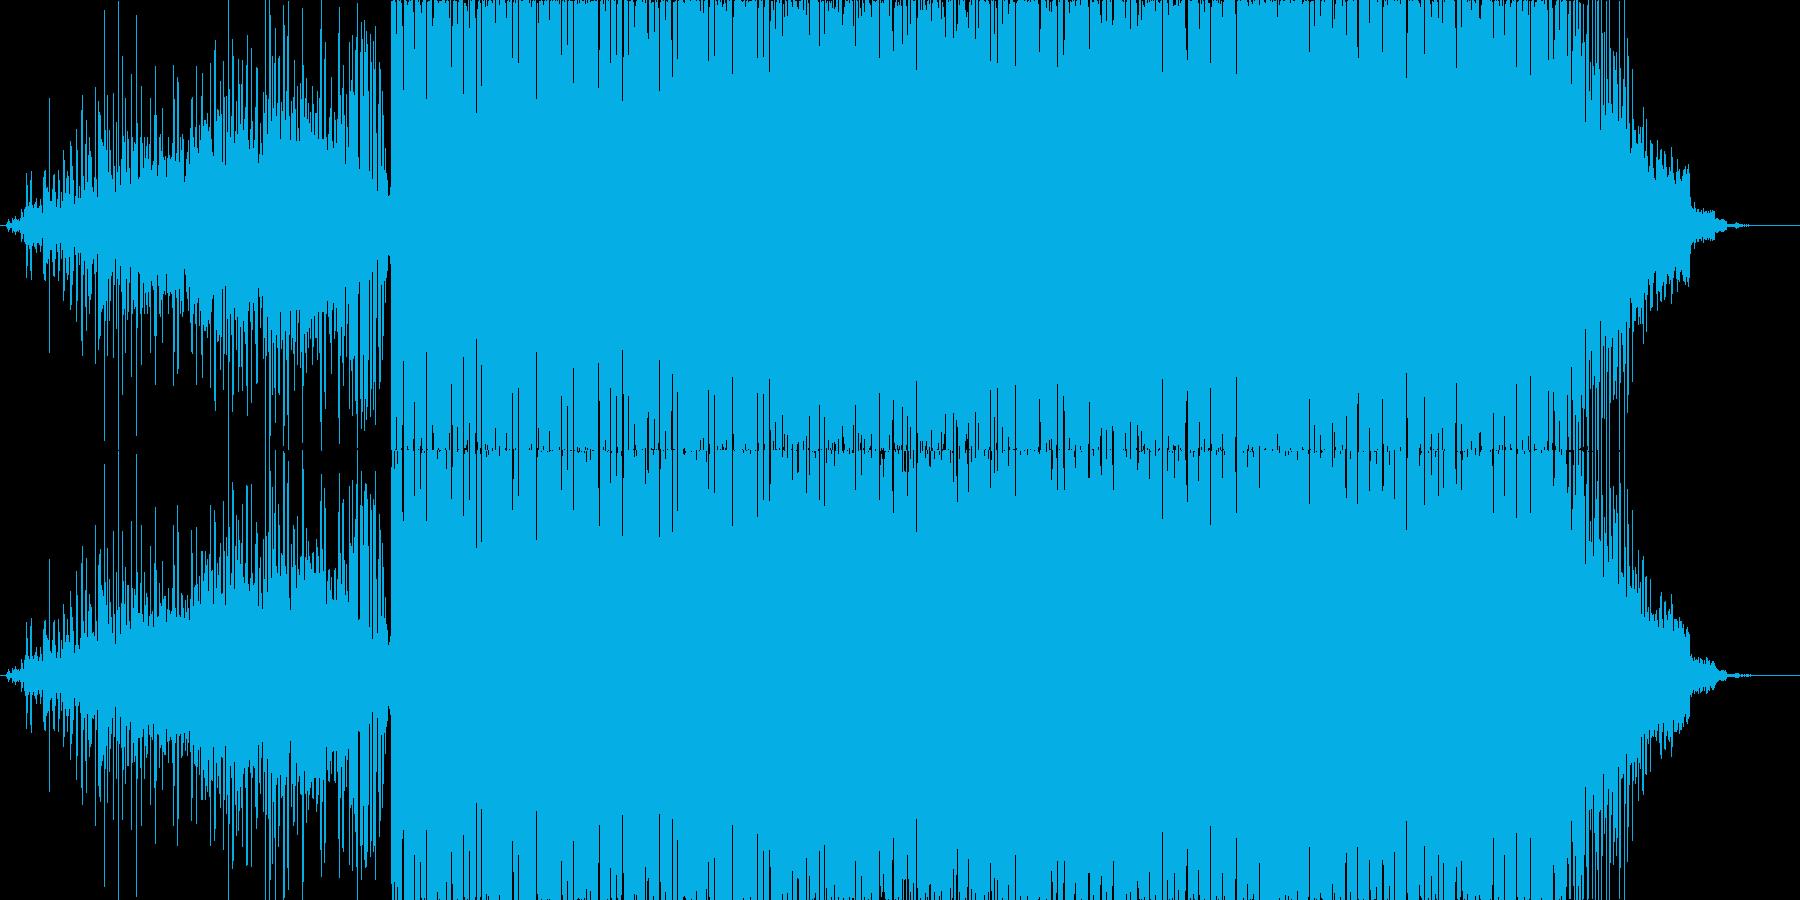 TB-303を使用したテクノの再生済みの波形